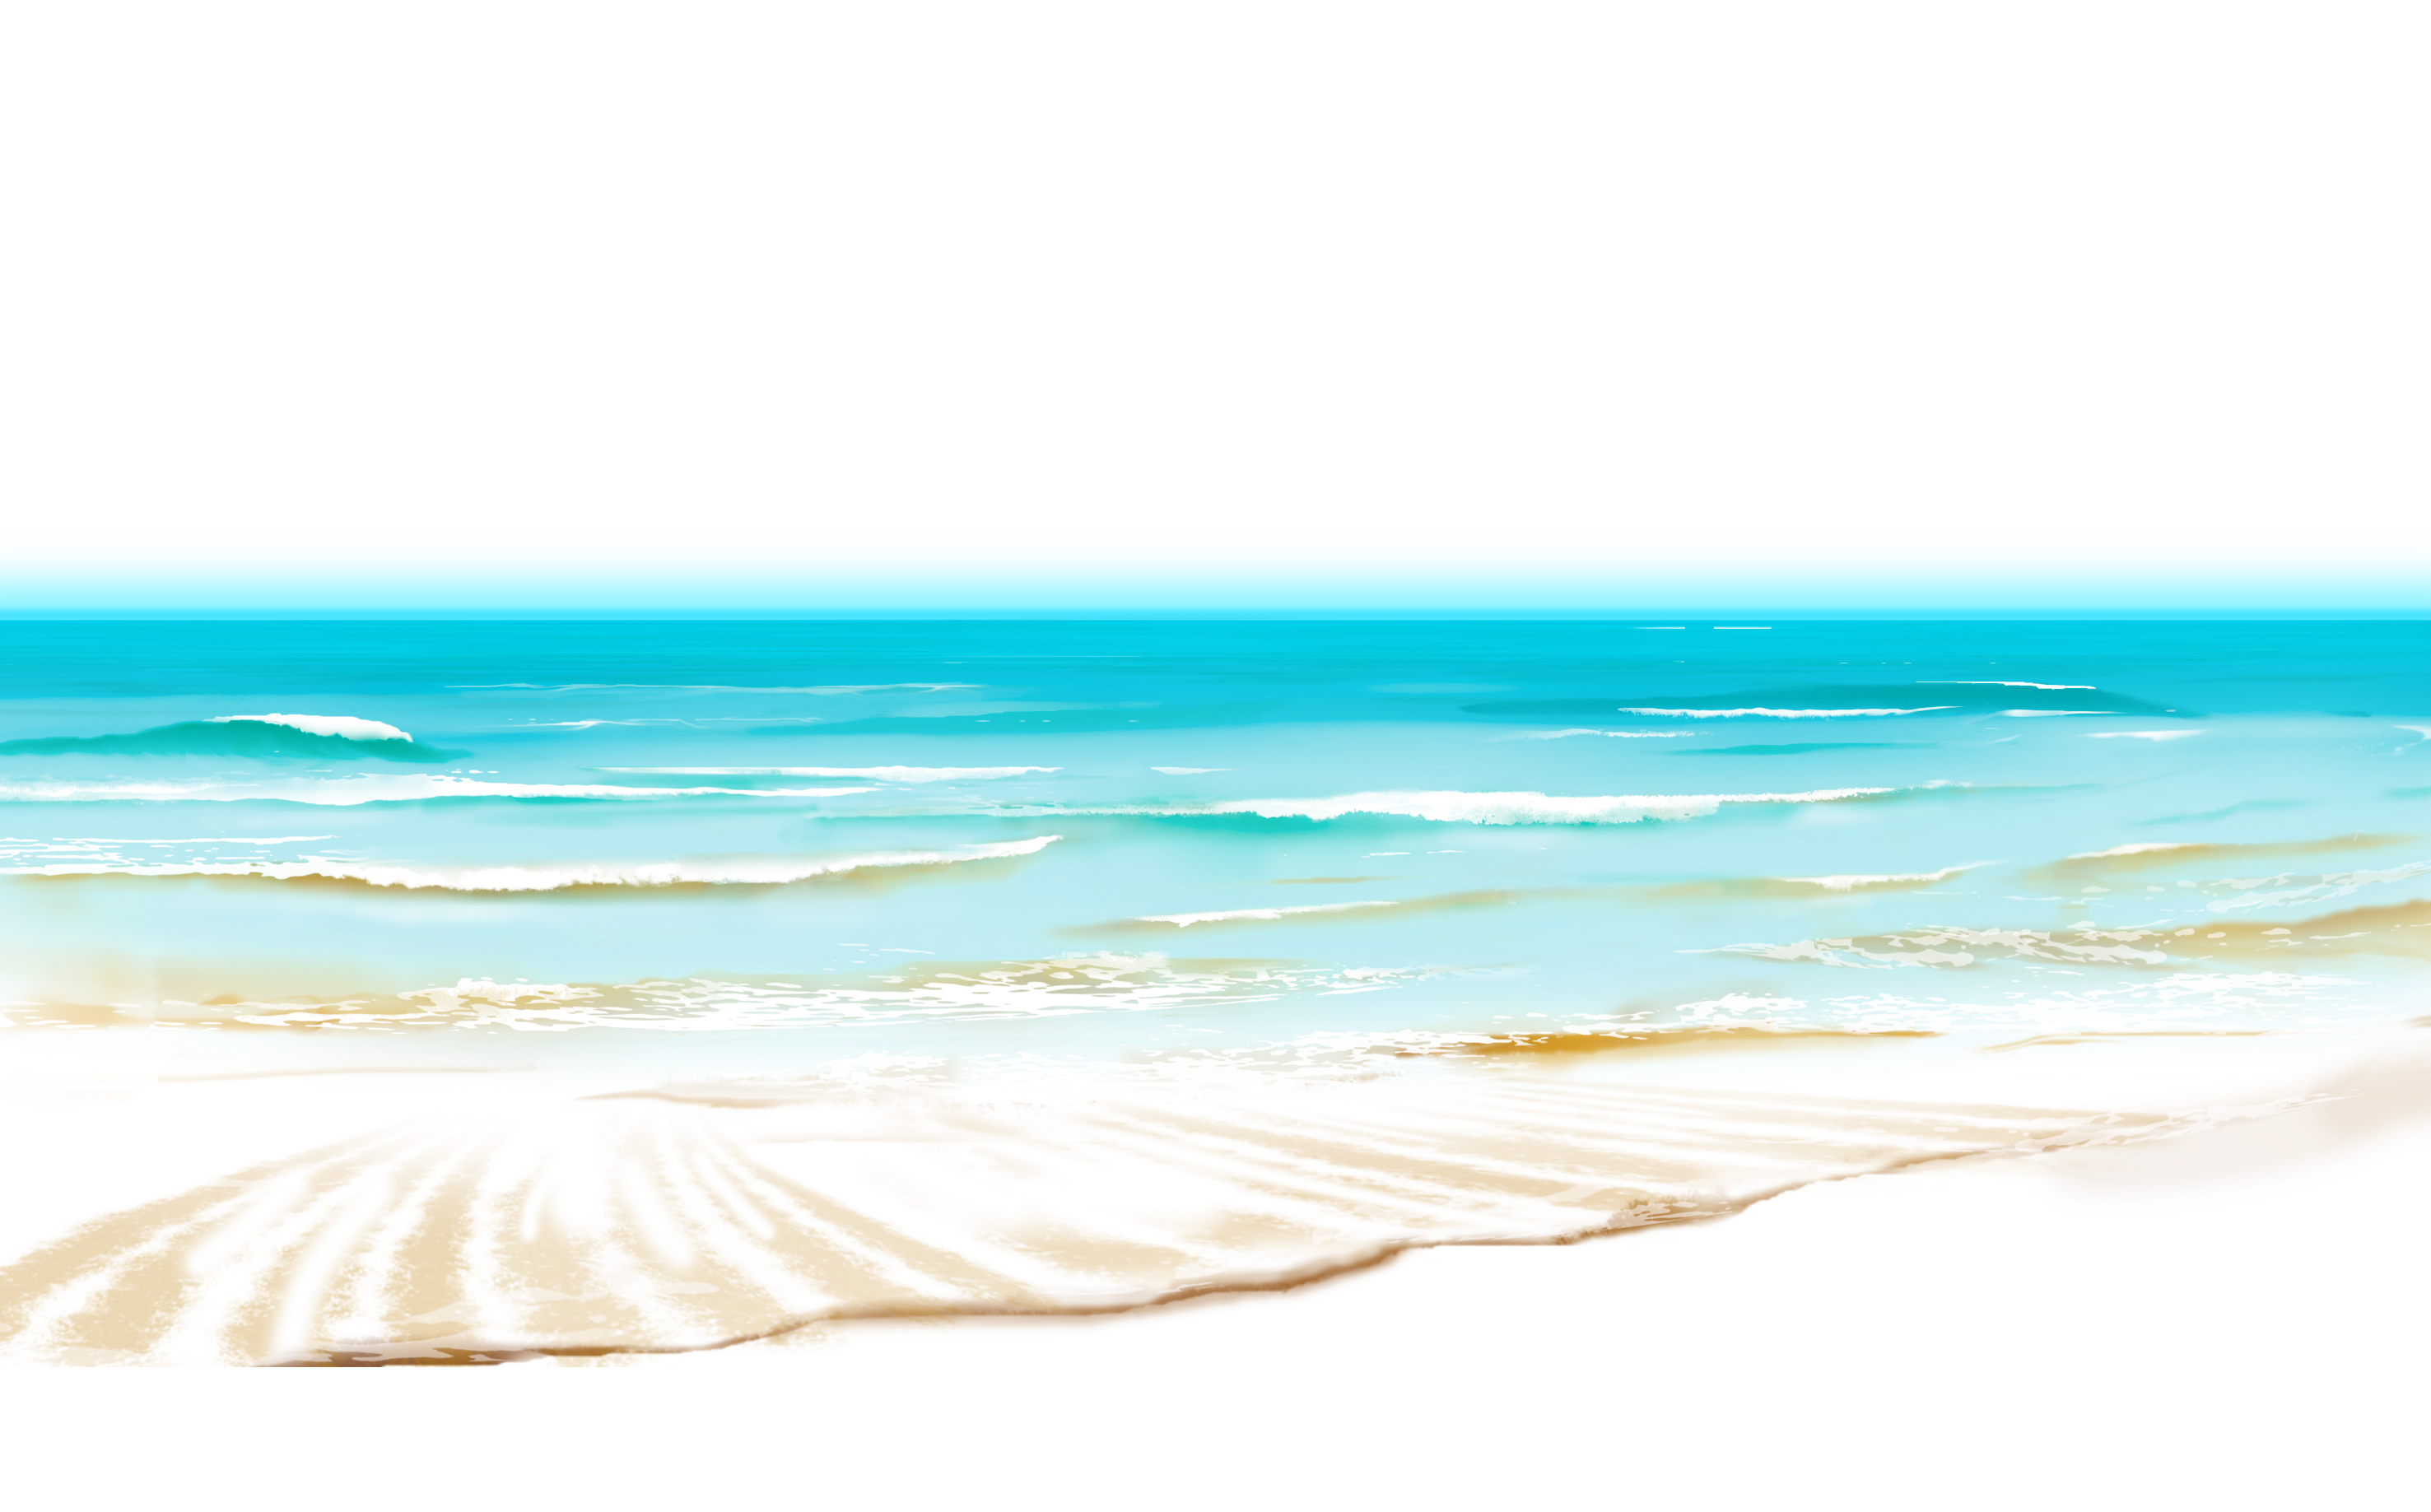 2953x1837 Sea Beach Ground Png Clipartu200b Gallery Yopriceville